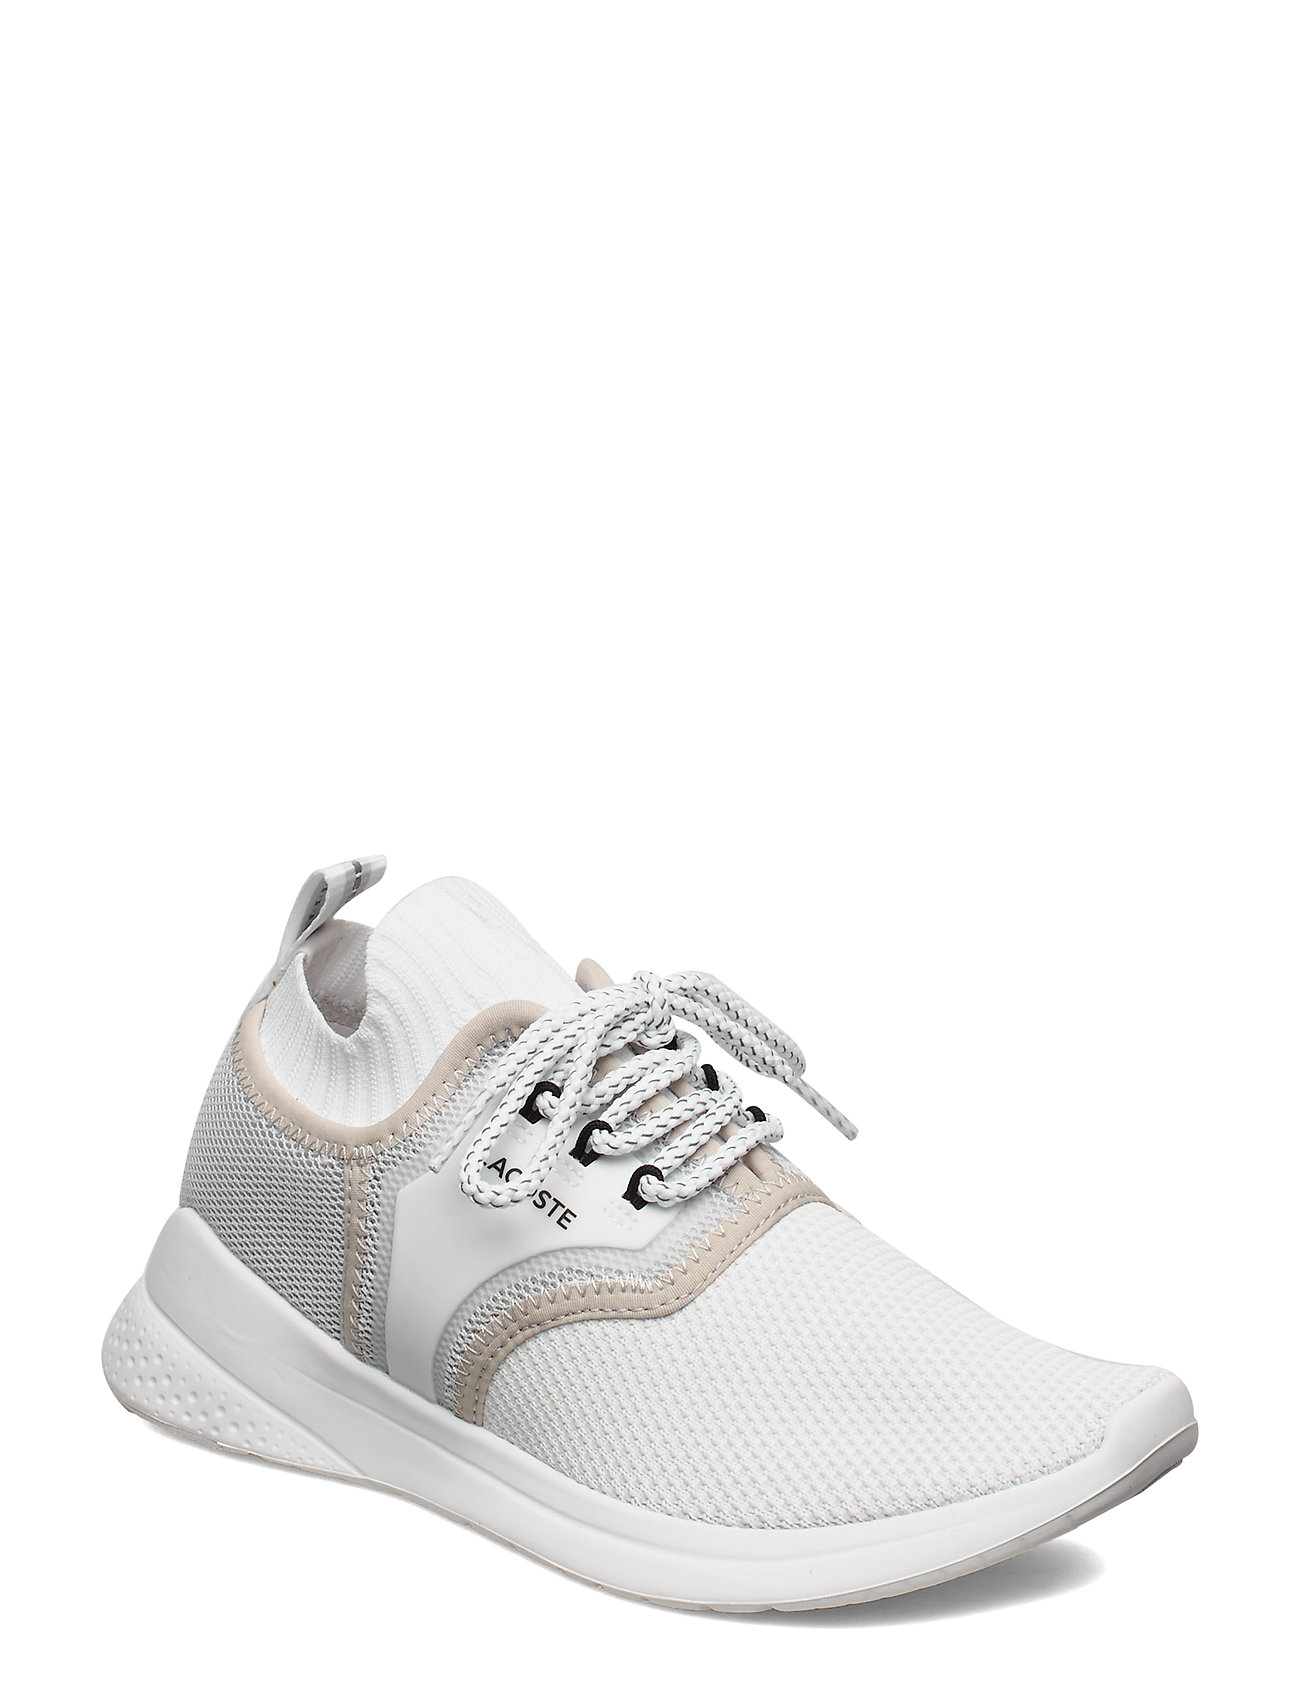 Image of Lt Sense 120 1 Sfa Low-top Sneakers Hvid Lacoste Shoes (3350045163)